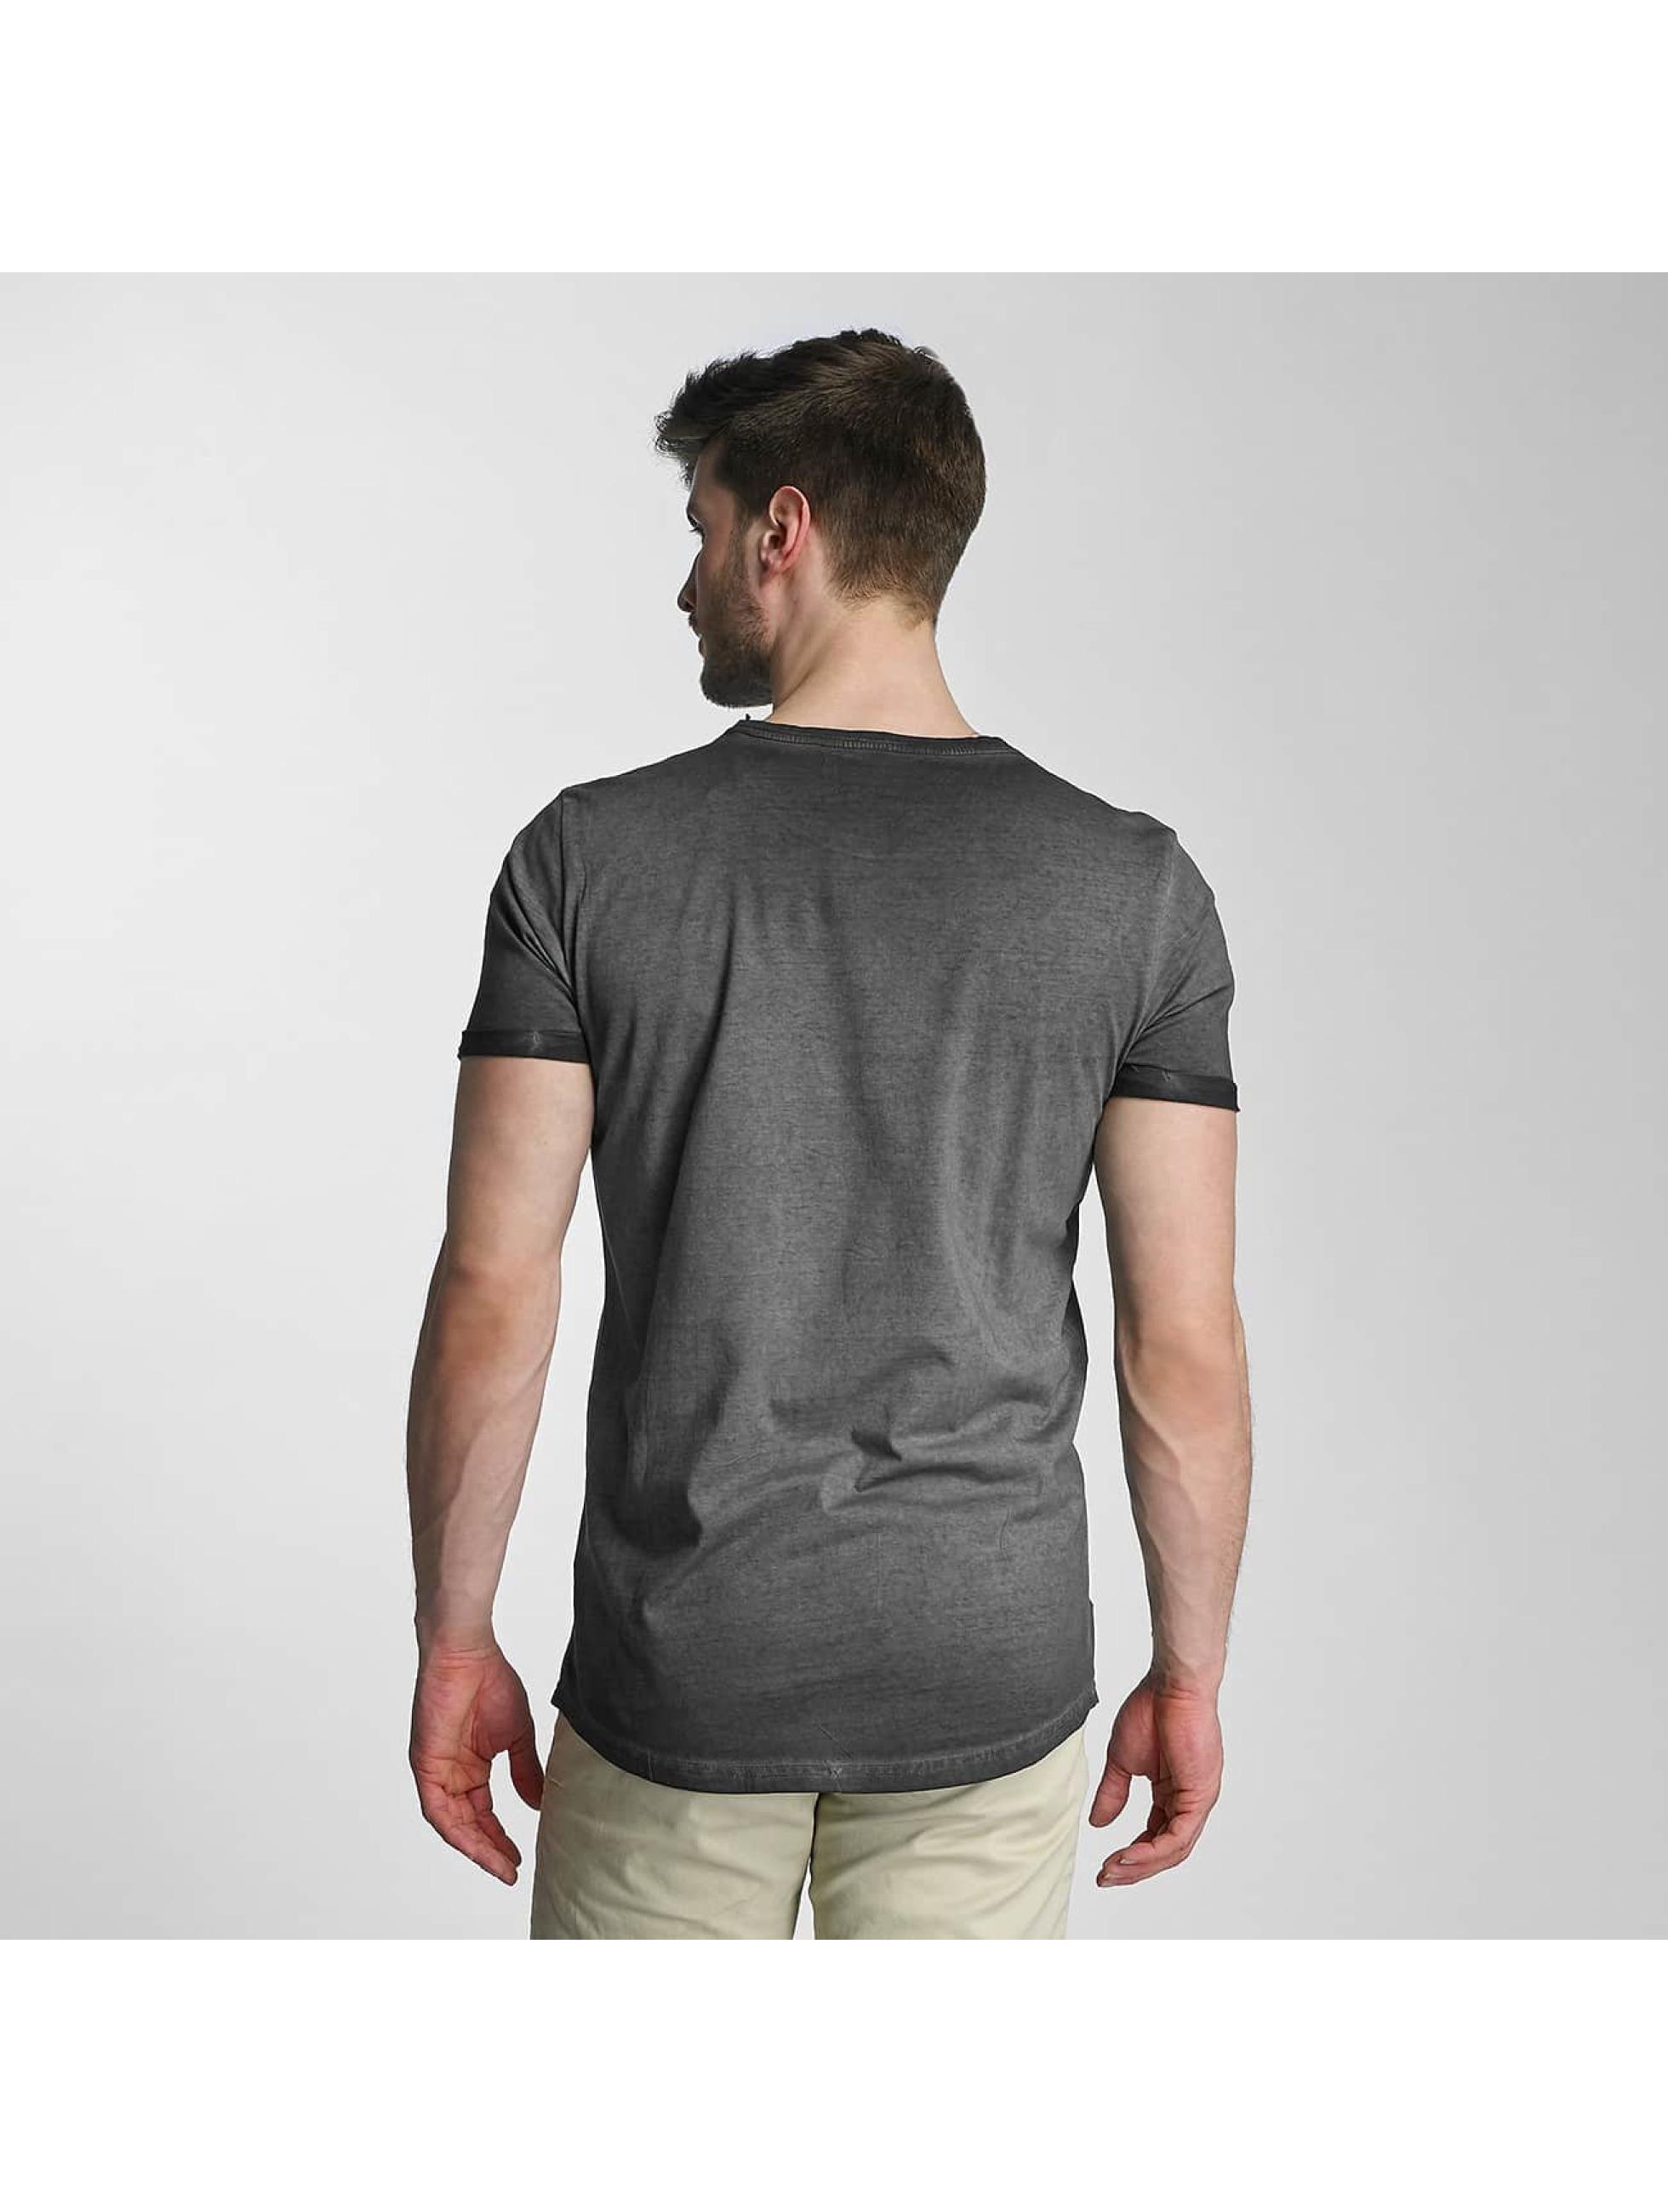 SHINE Original T-Shirt Dirt Dye Wash black